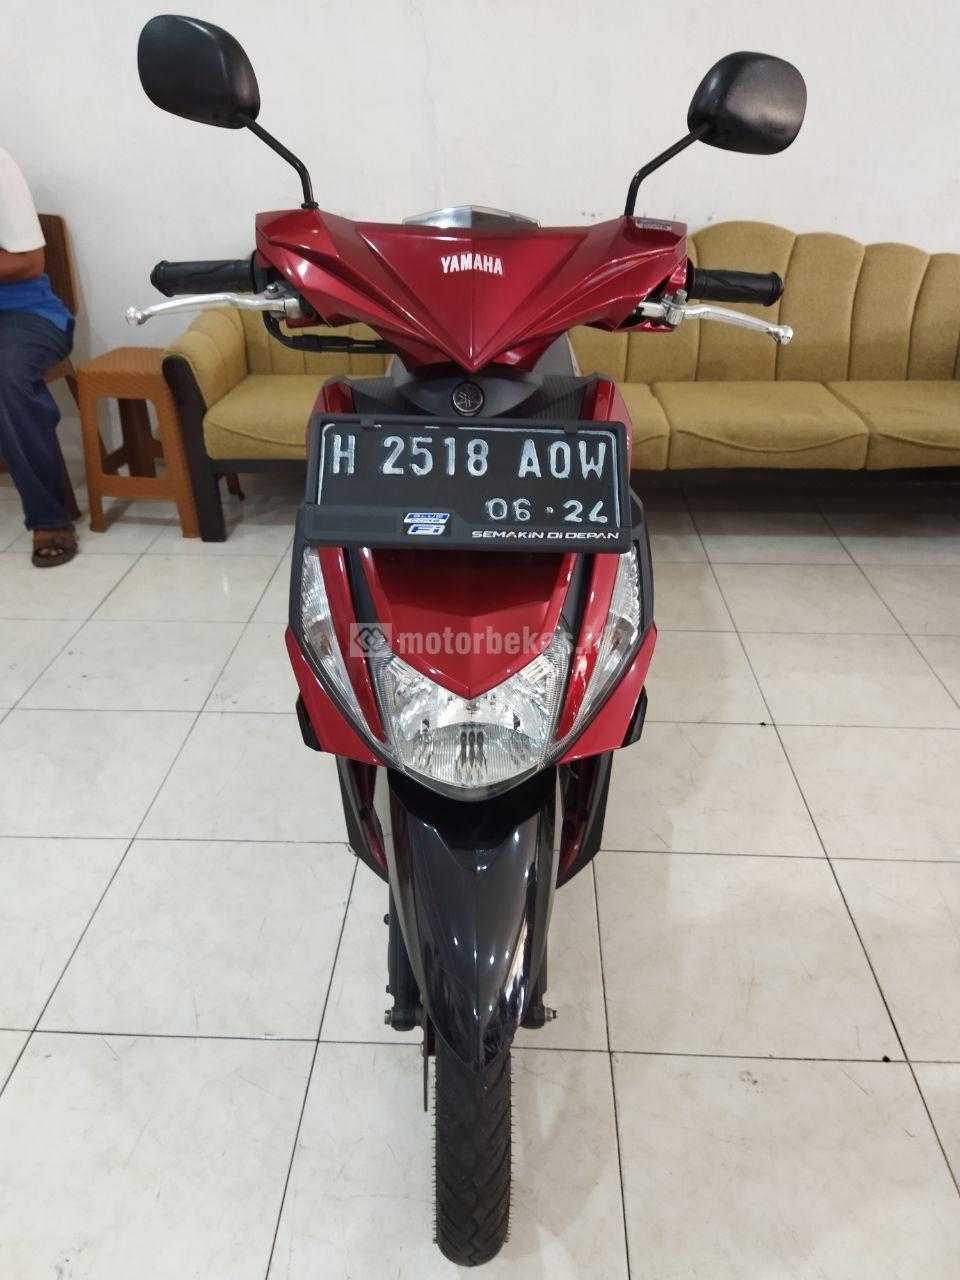 YAMAHA MIO M3 125  1060 motorbekas.id